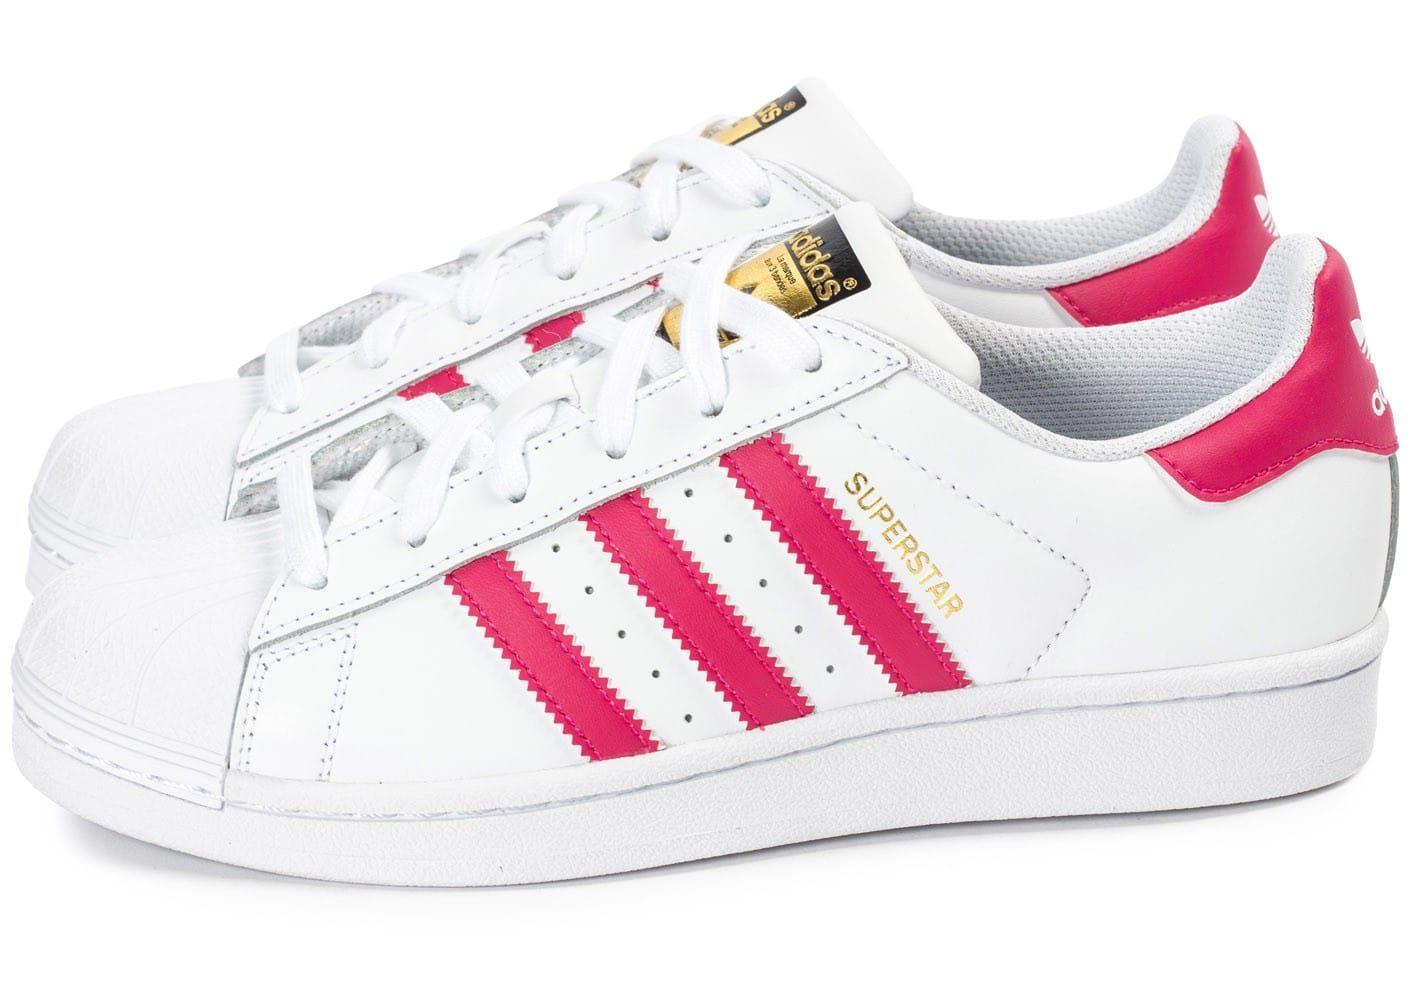 Chaussures adidas Superstar Foundation Junior blanche et rose vue extérieure